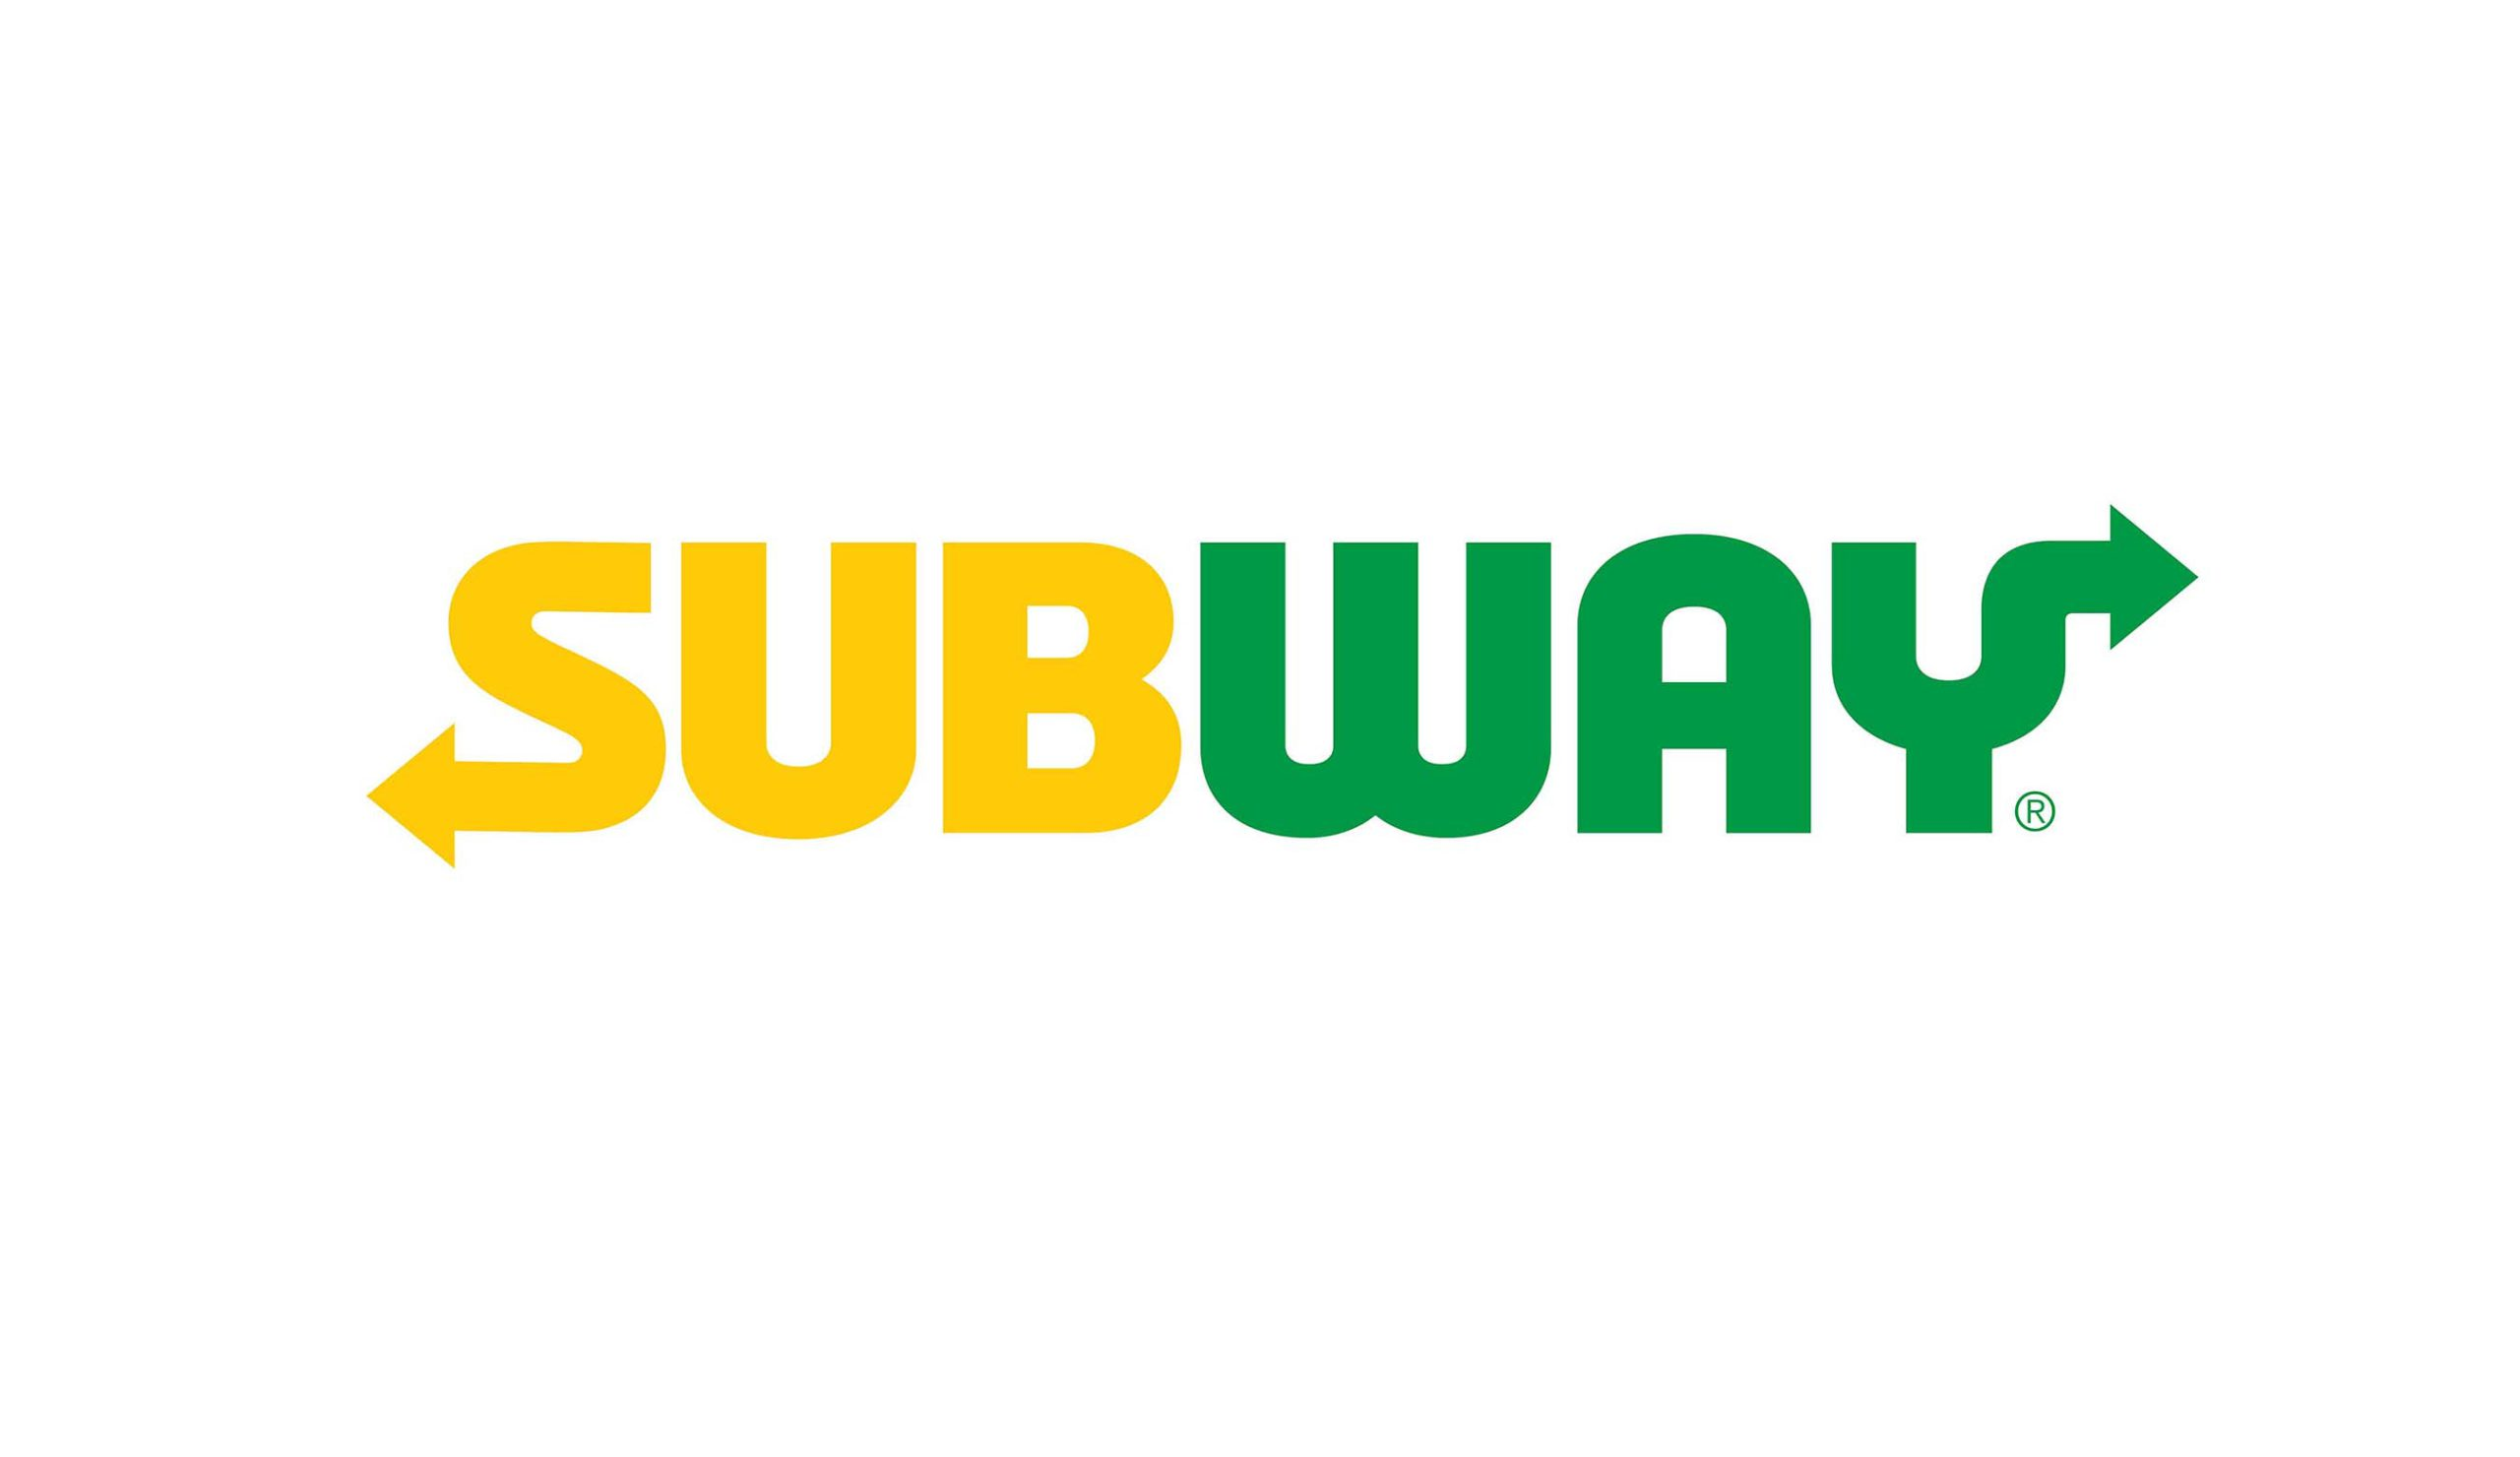 new-subway®-retaurants-logo-5-HR